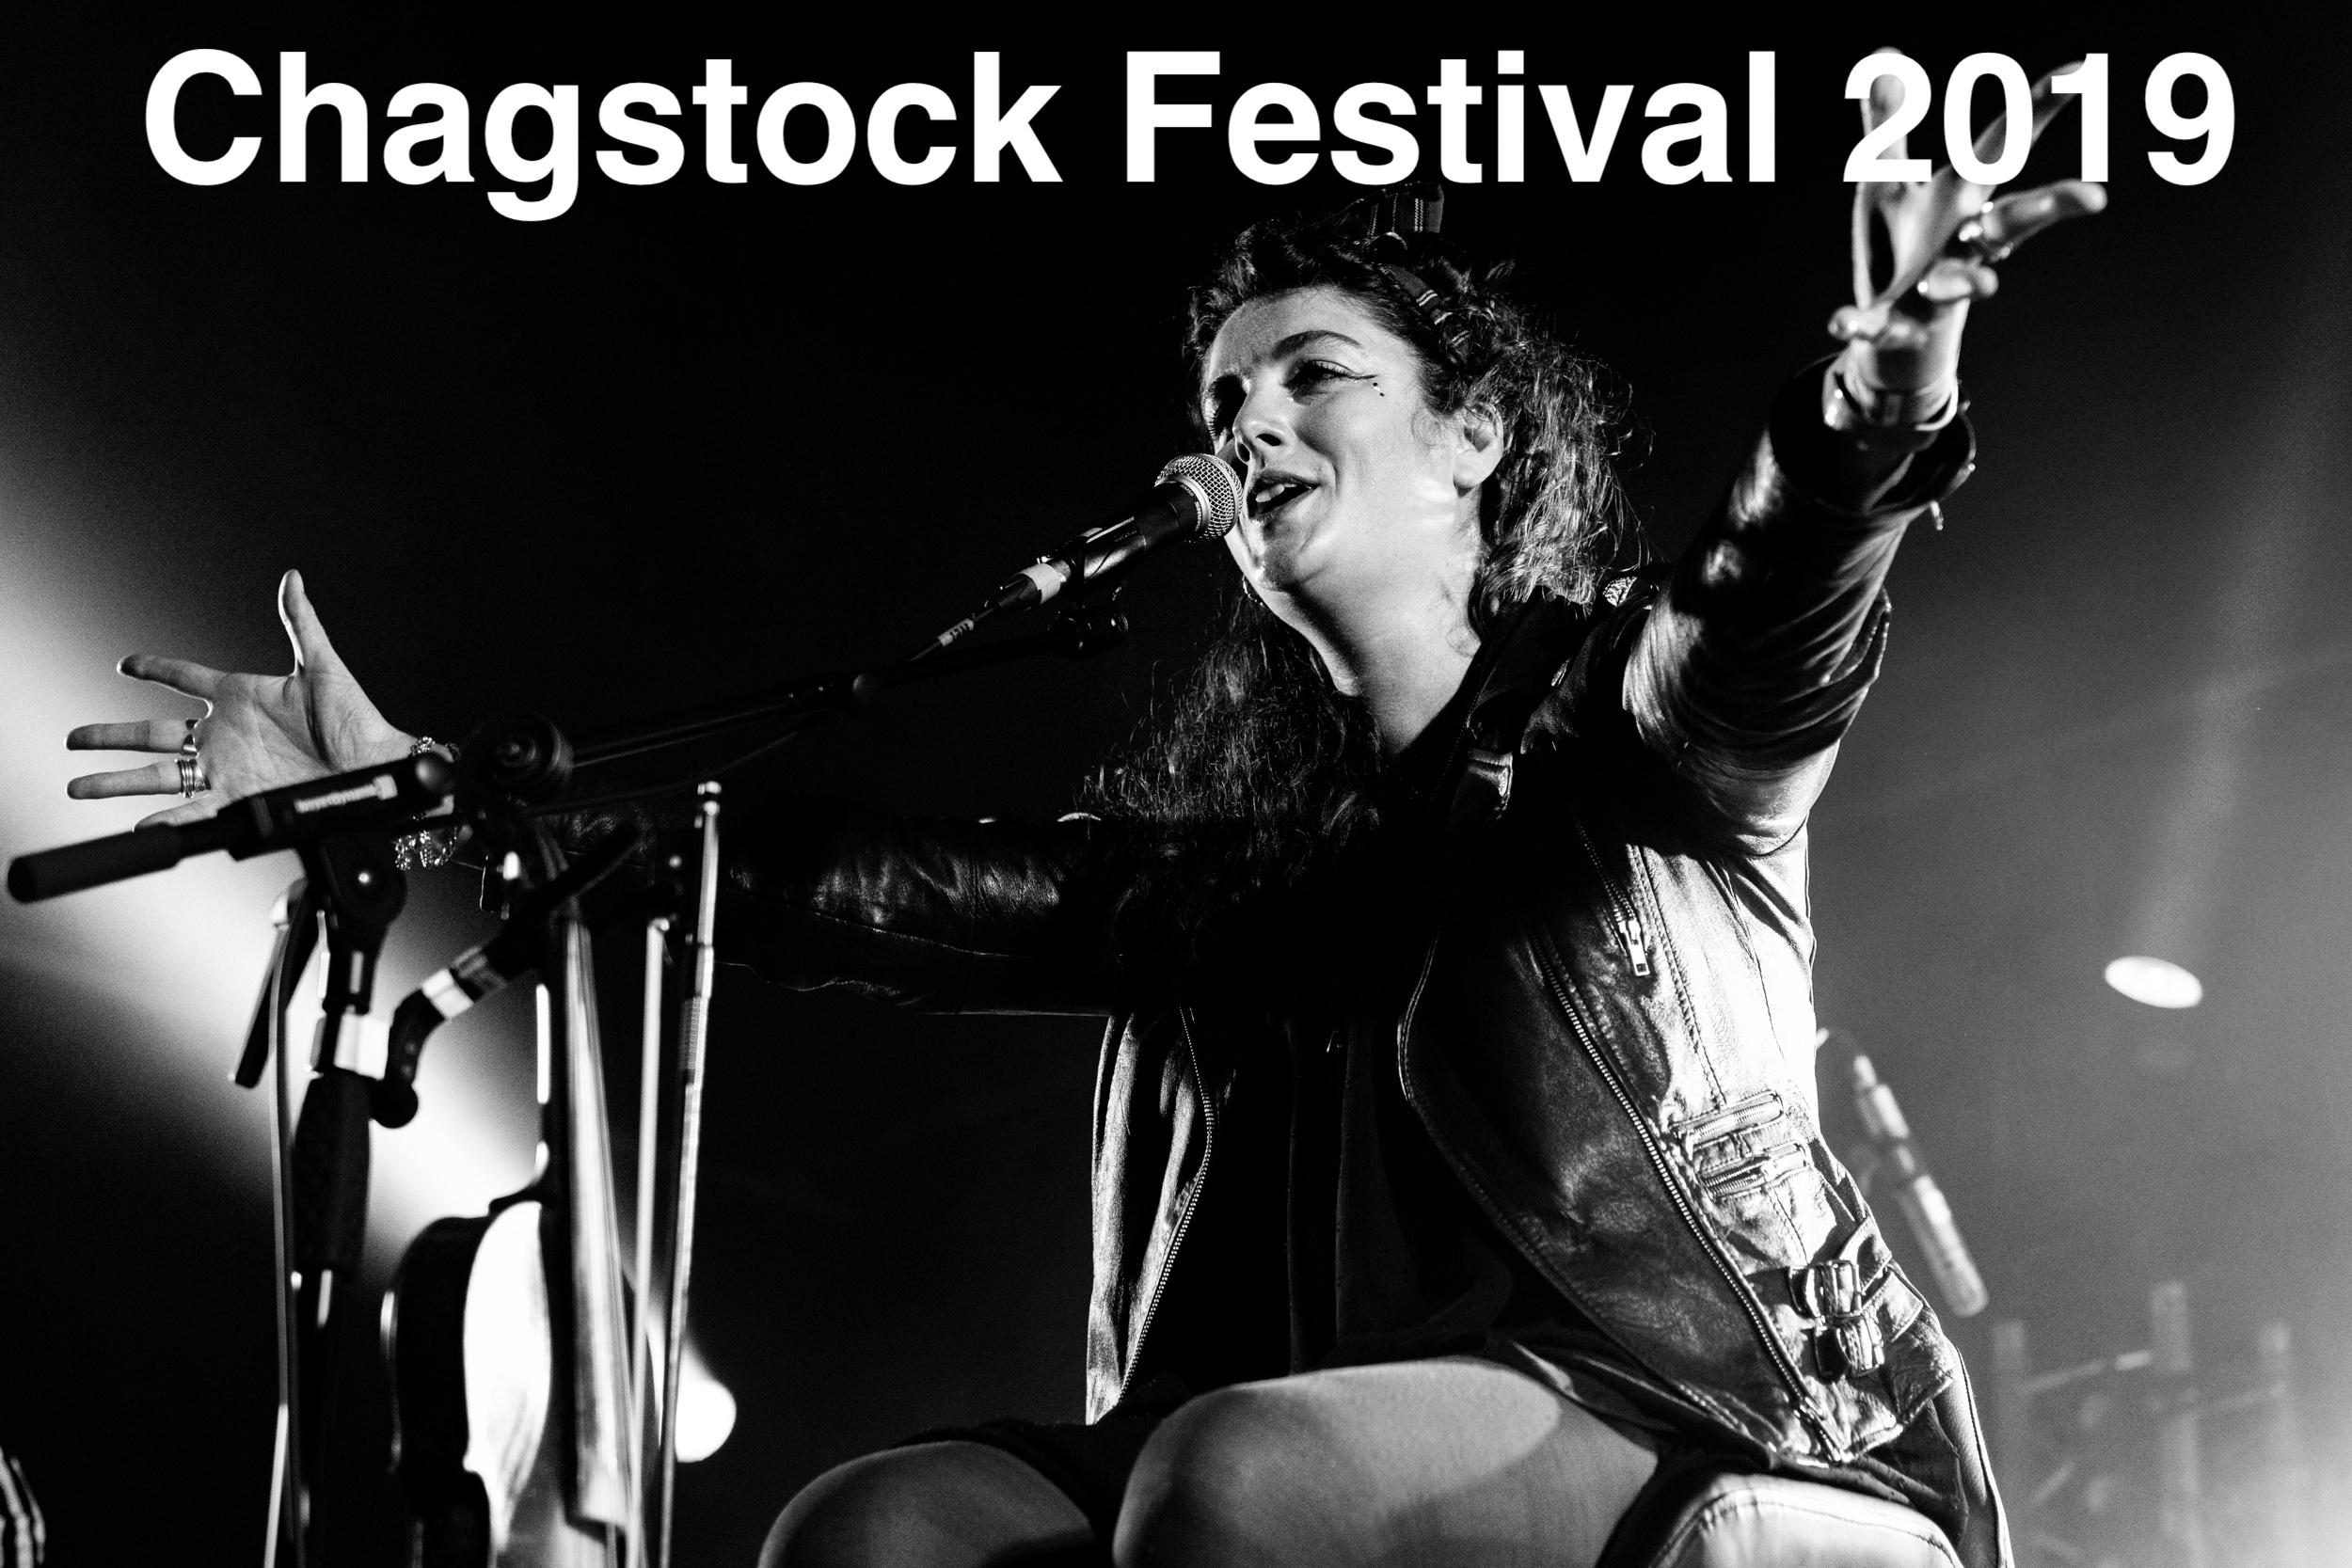 Chagstock Music Festival 2019a - sm_Chagstock Music Festival 2019_HOB_9794.jpg